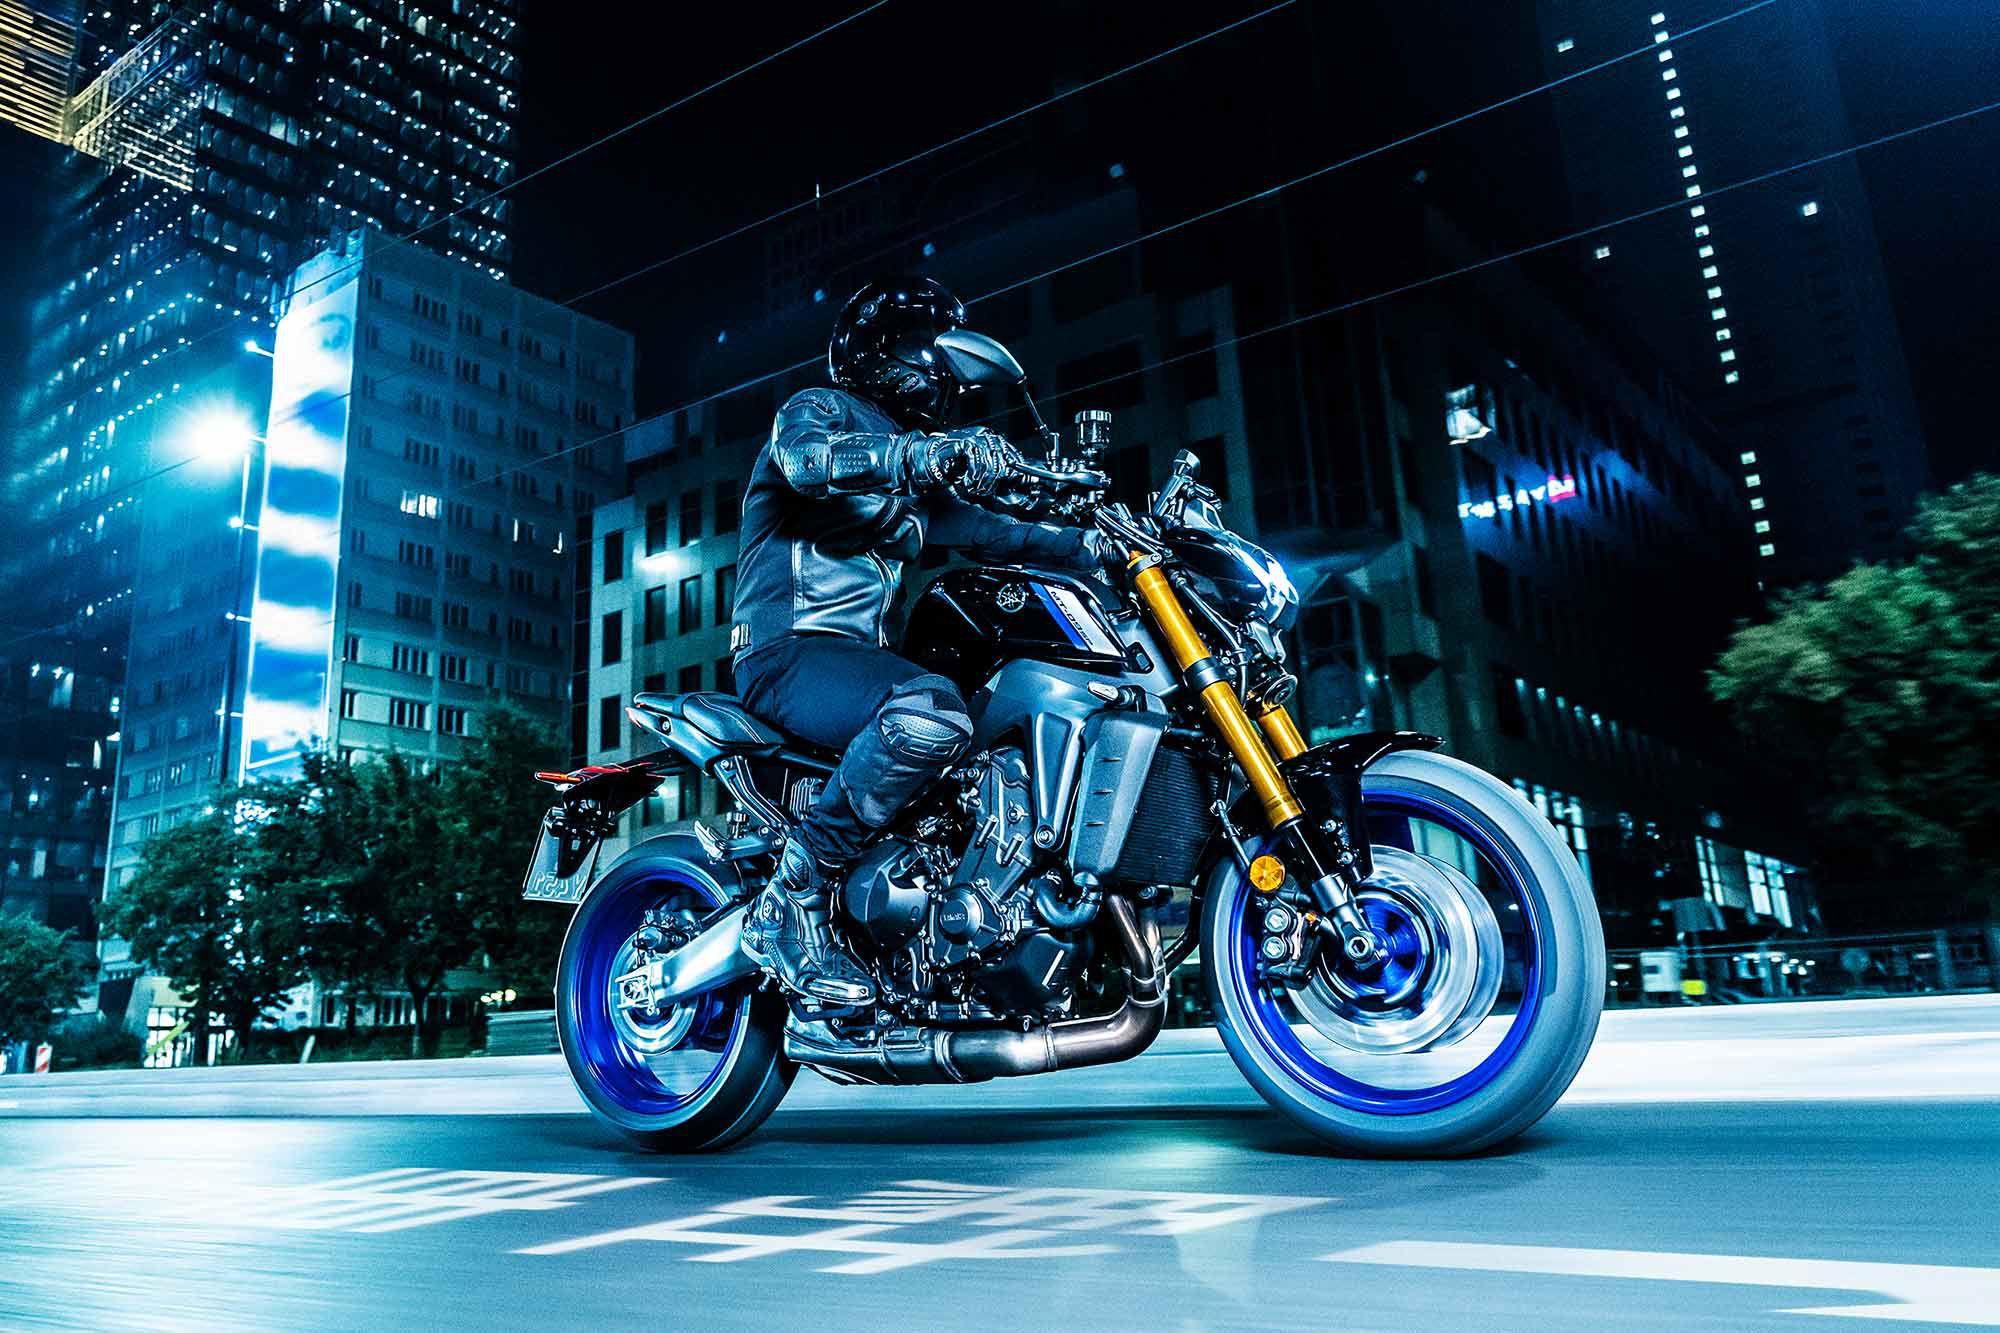 2021 Yamaha MT-09 SP (Raven / Liquid Metal)